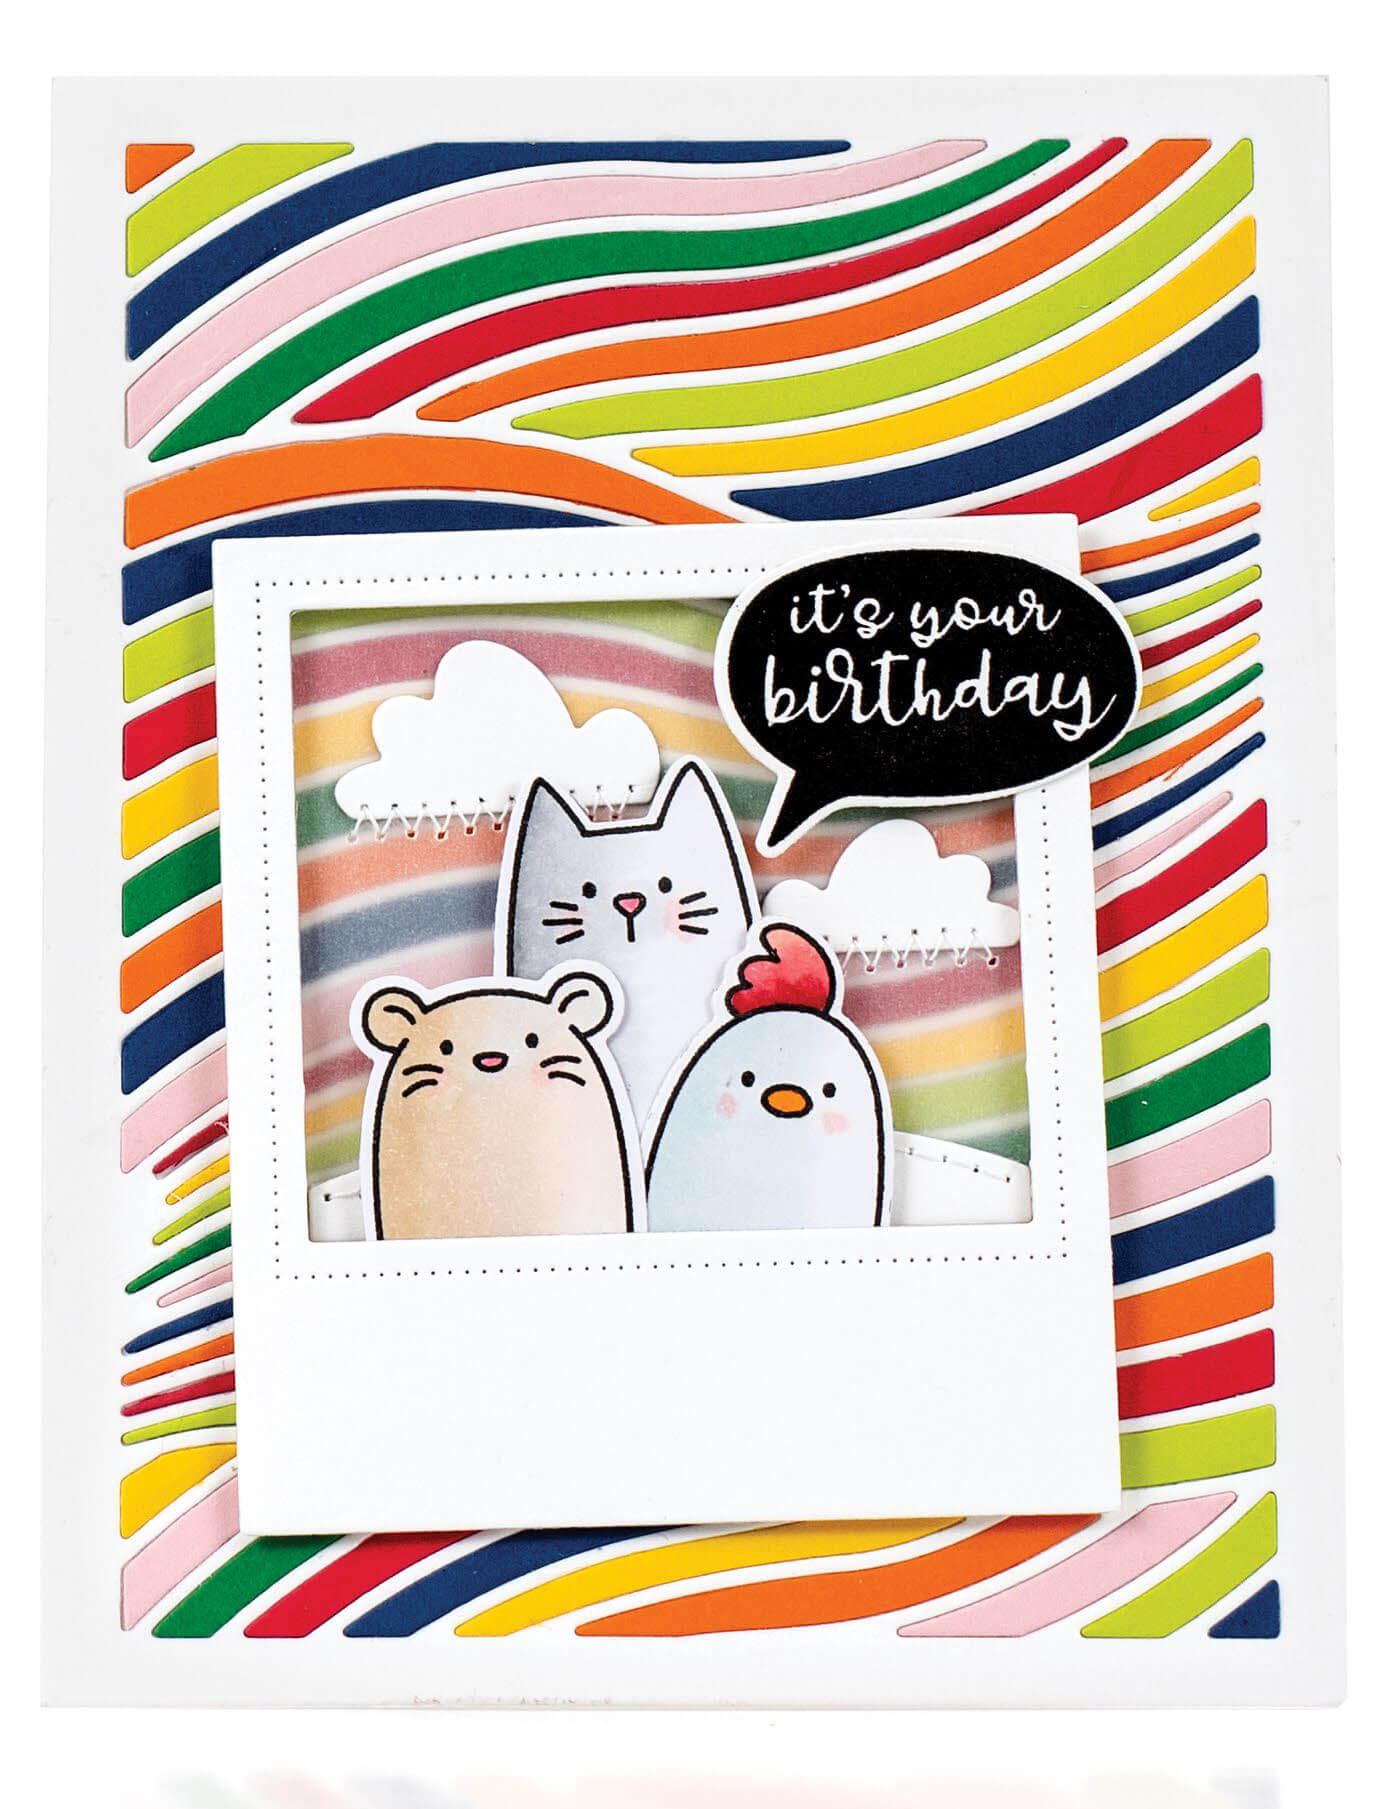 Scrapbook & Cards Today - Summer 2019 - It's Your Birthday card by Jill Dewey Hawkins